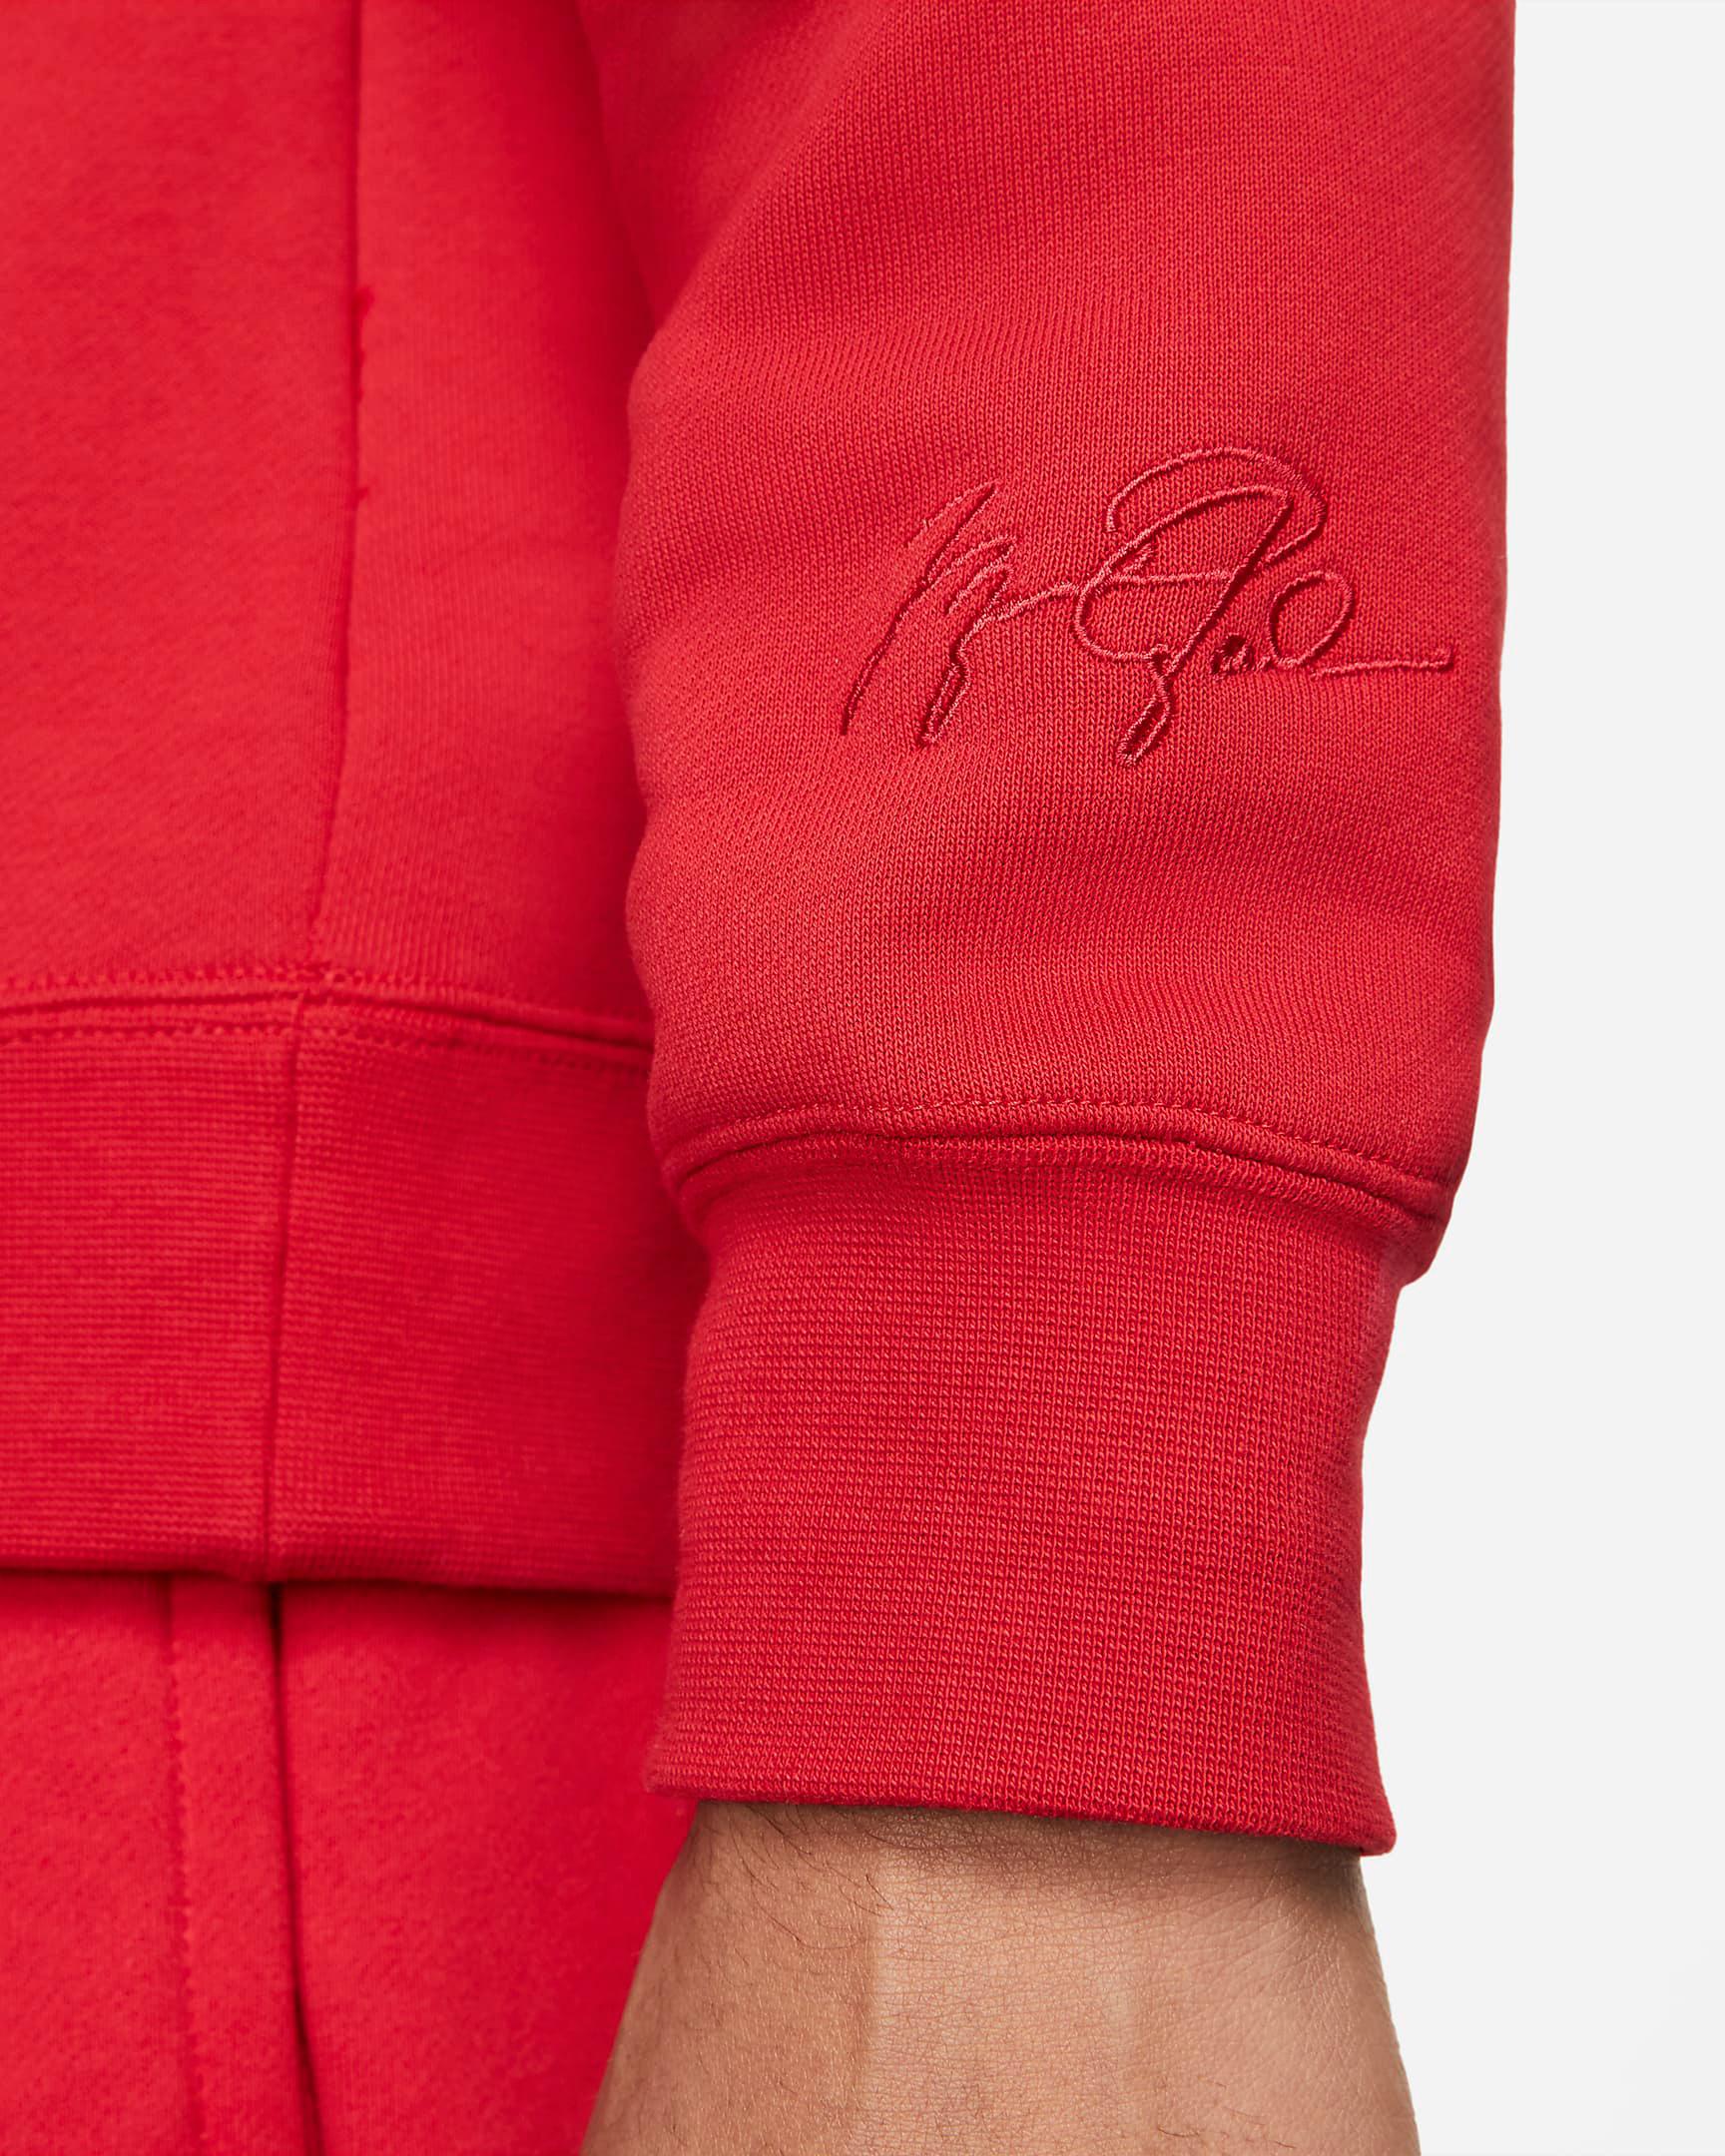 jordan-gym-red-essentials-sweatshirt-3